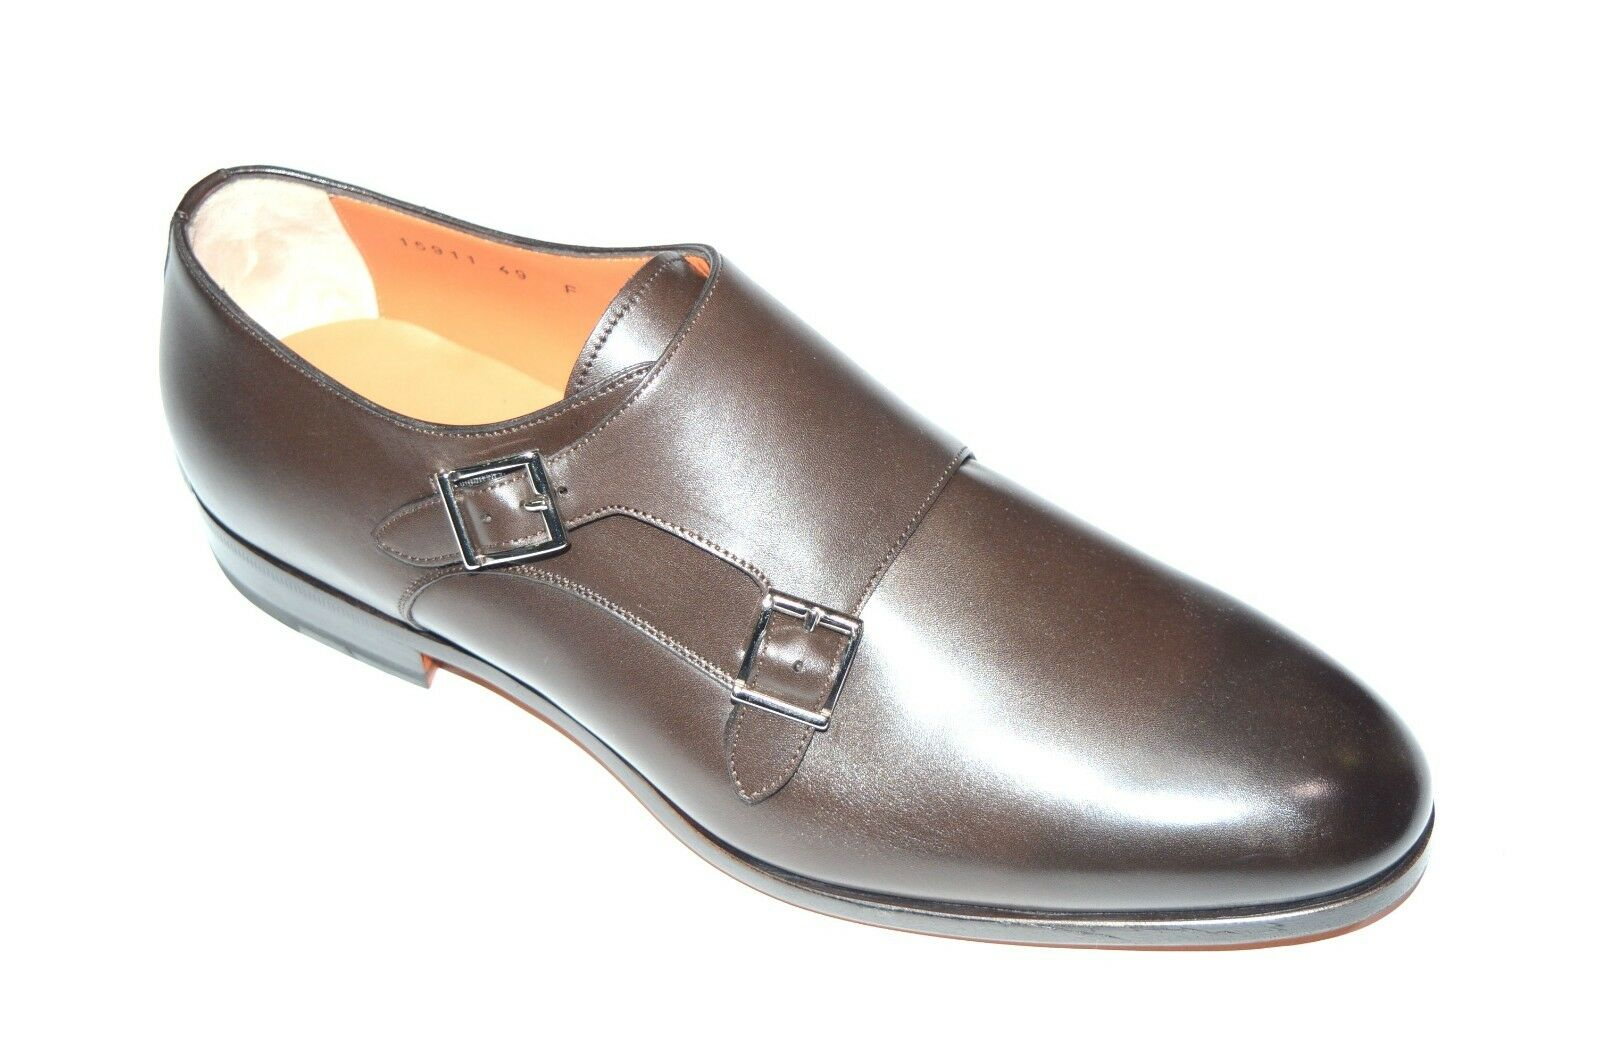 NEW SANTONI Dress Pelle Shoes Monk Strap Us SIZE Eu 41.5 Uk 7.5 Us Strap 8.5 (18R) b4521e